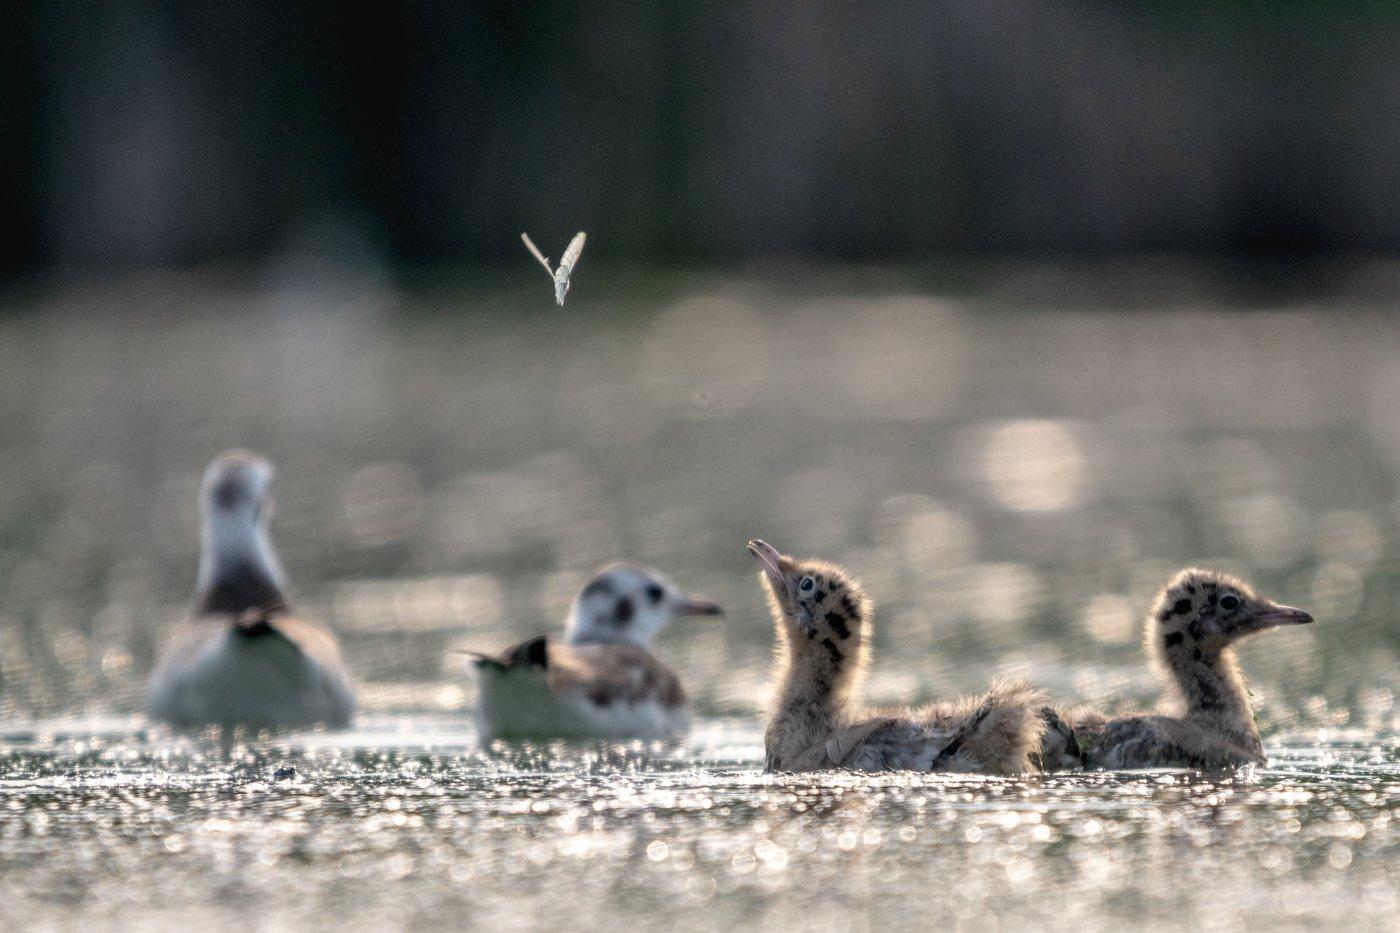 птенец, озерная чайка, бабочка, Дмитрий Дубиковский